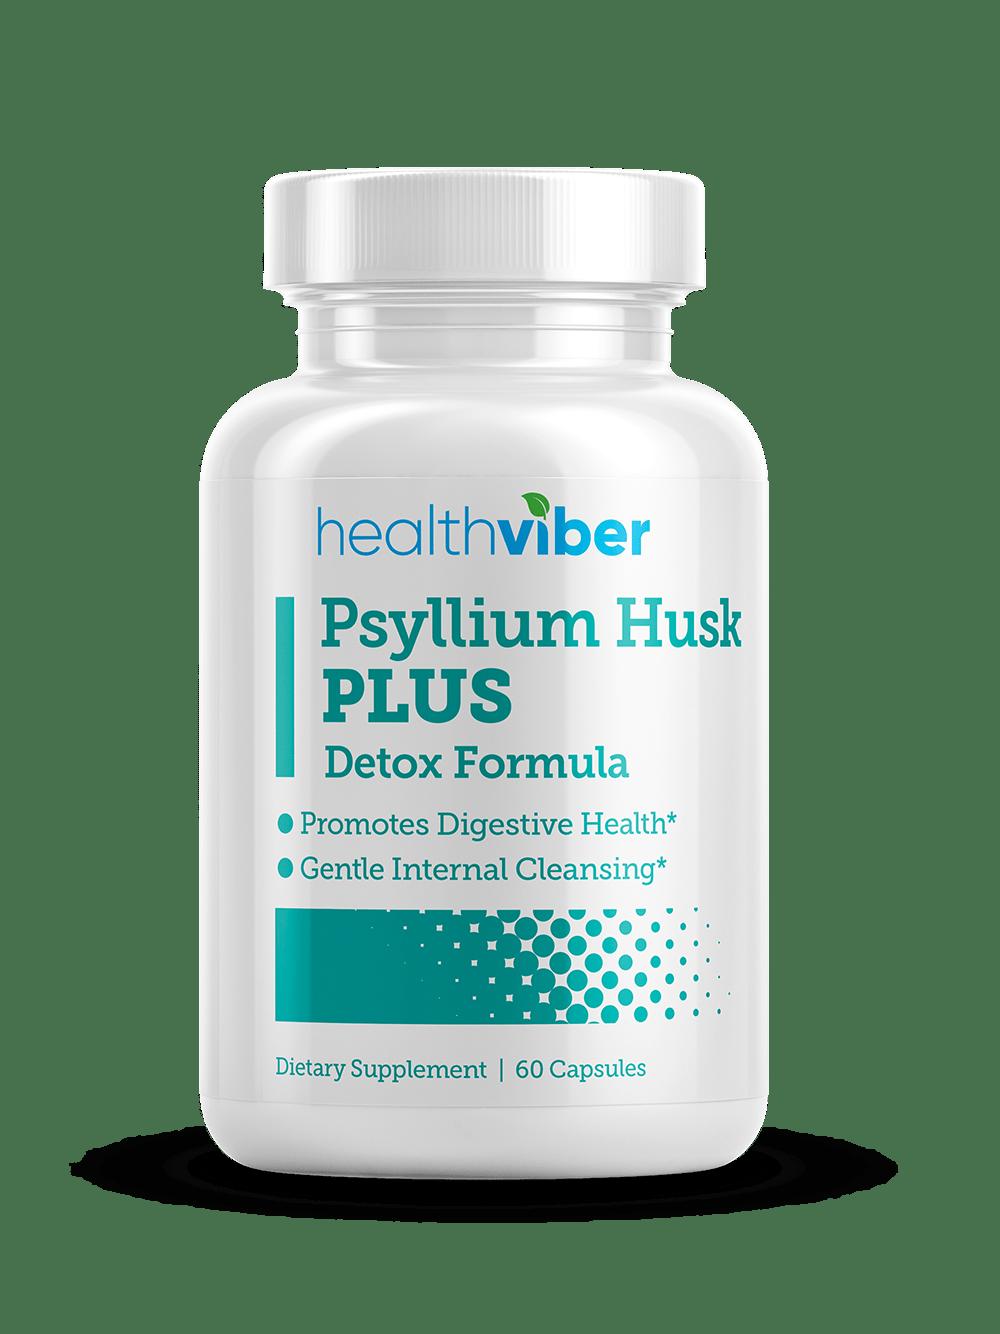 Psyllium Husk Plus